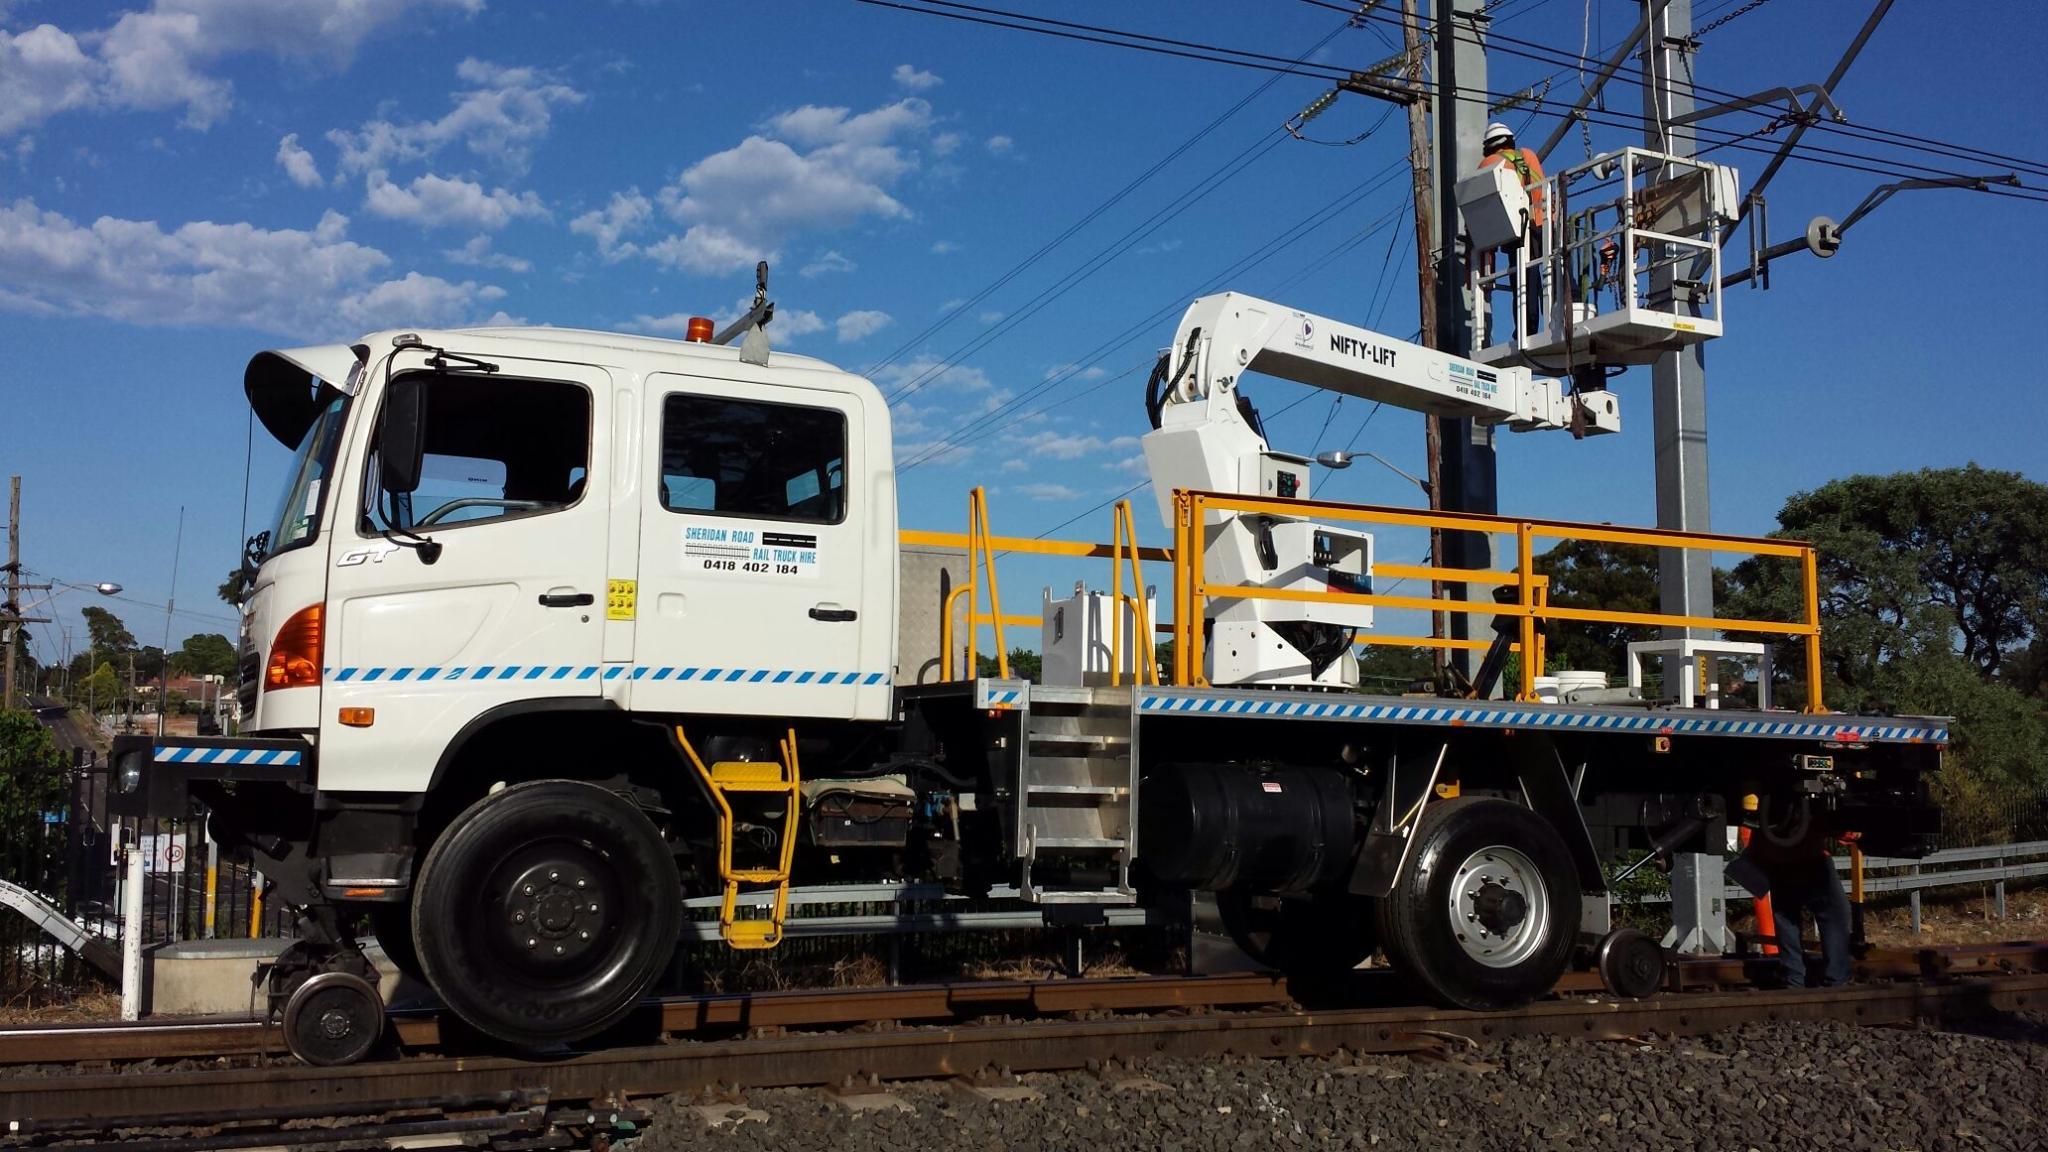 2LIFTU-Hirail-Cherry-Picker-EWP-4WD-Dual-Cab-Hino-7.jpg